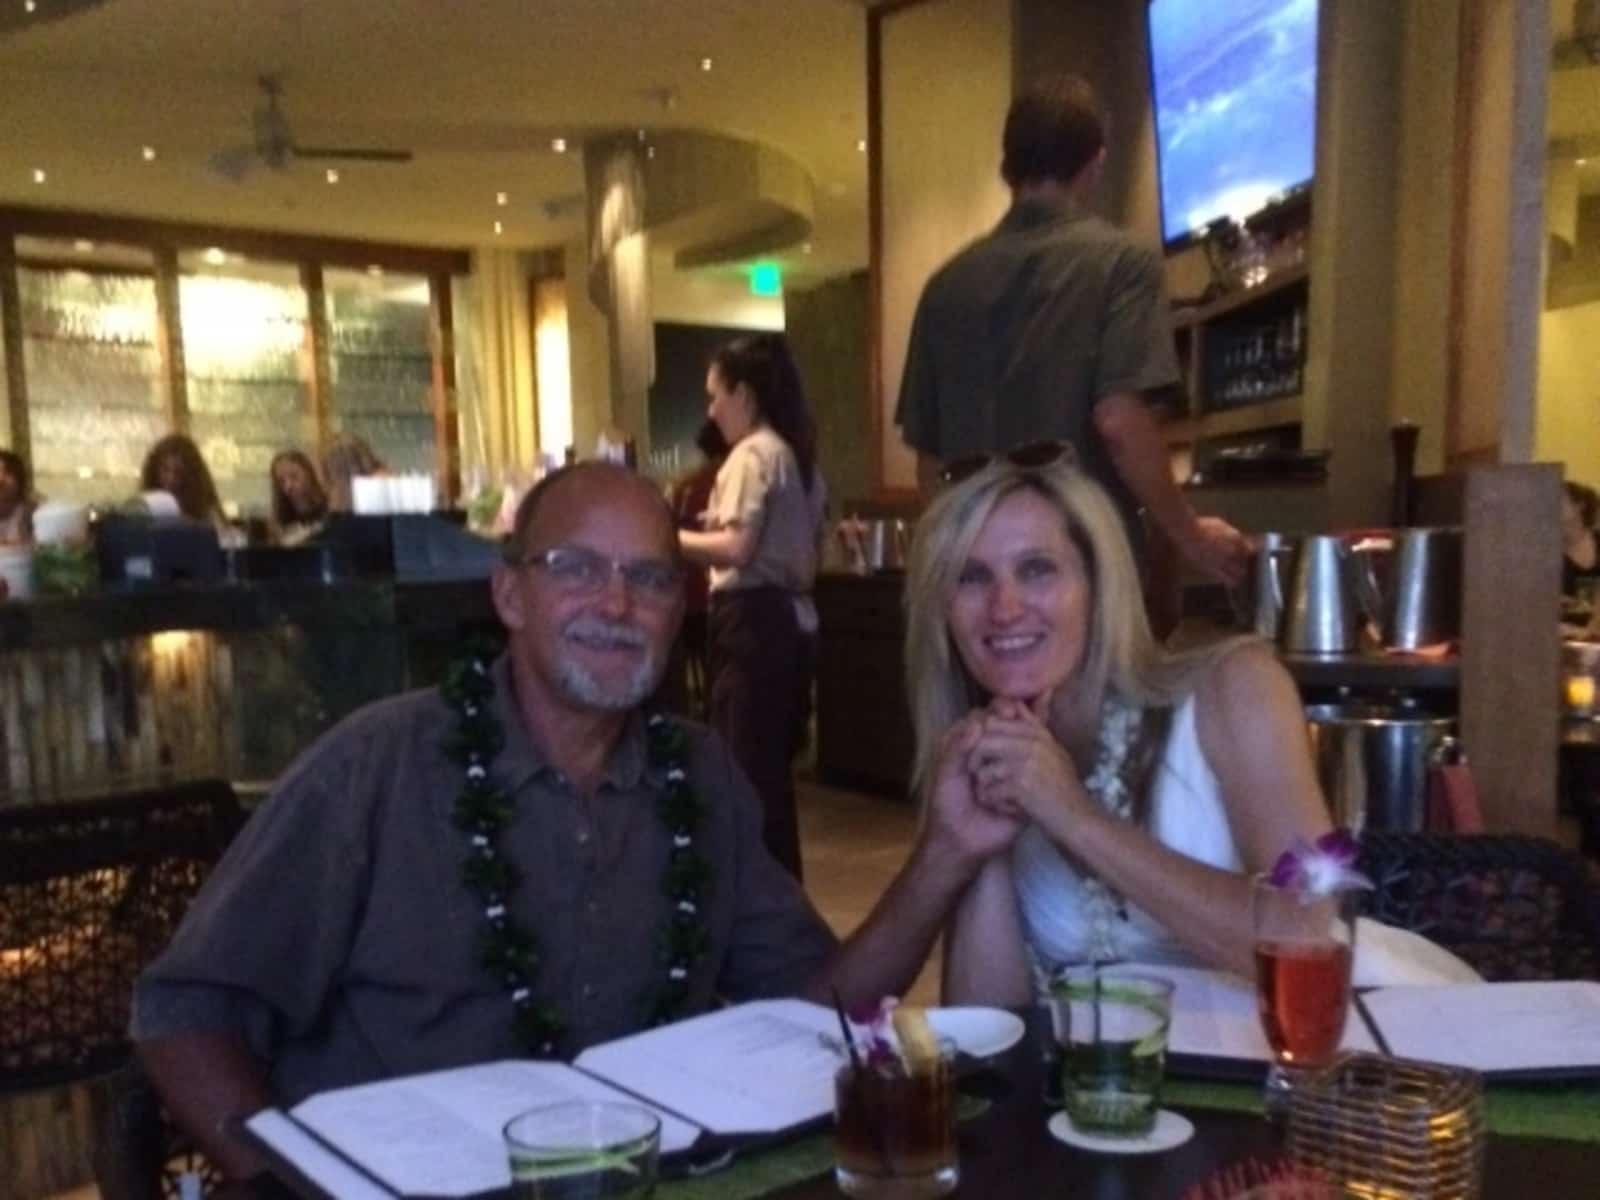 Anja & Gary from Vista, California, United States